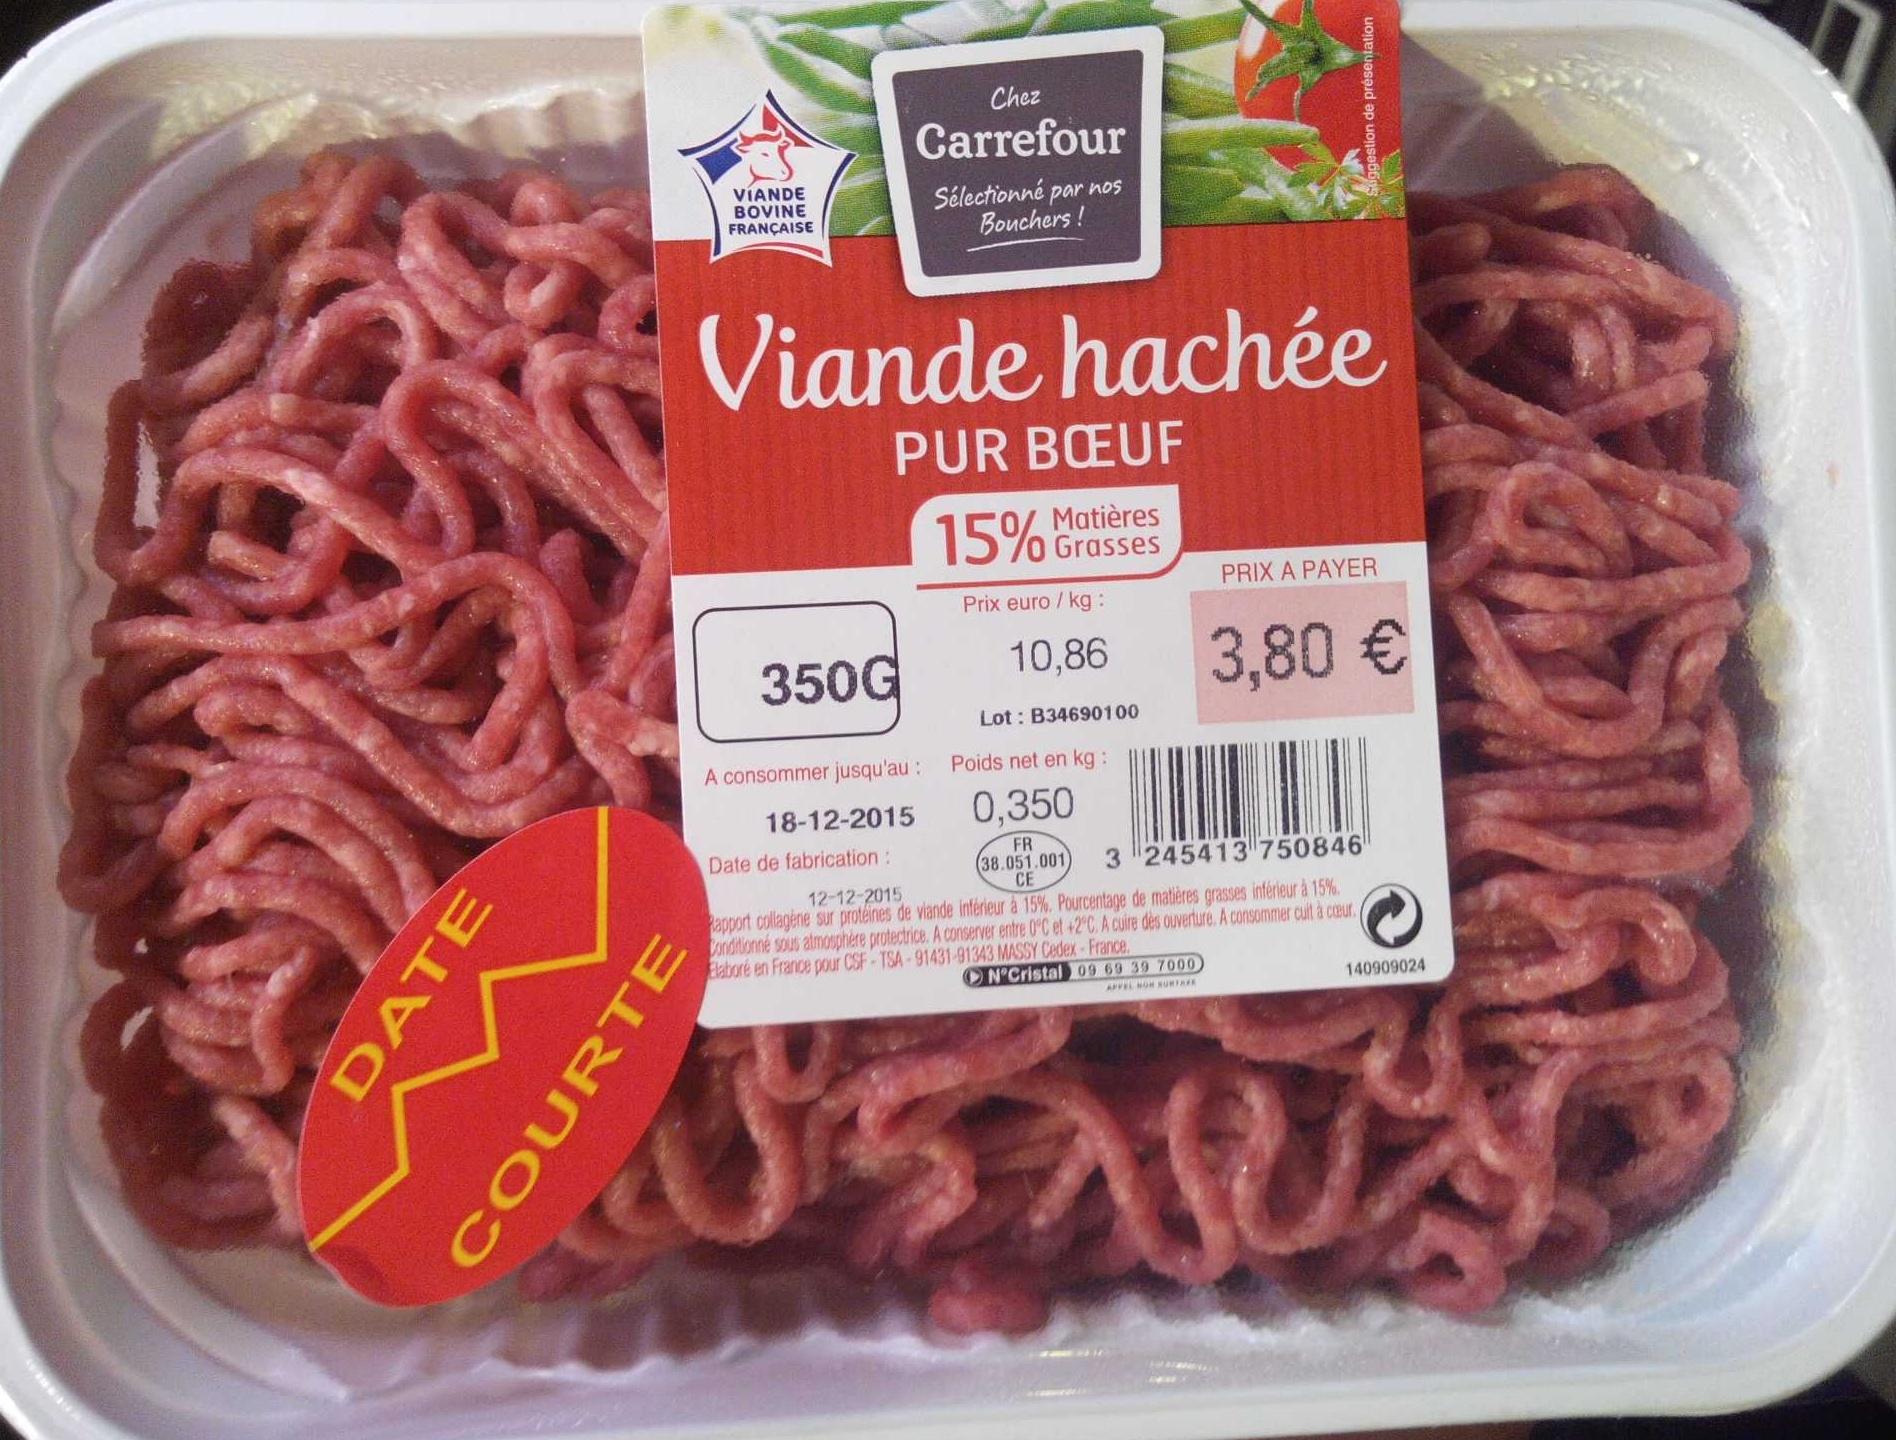 Viande hachée pur boeuf (15% MG) - Produkt - fr